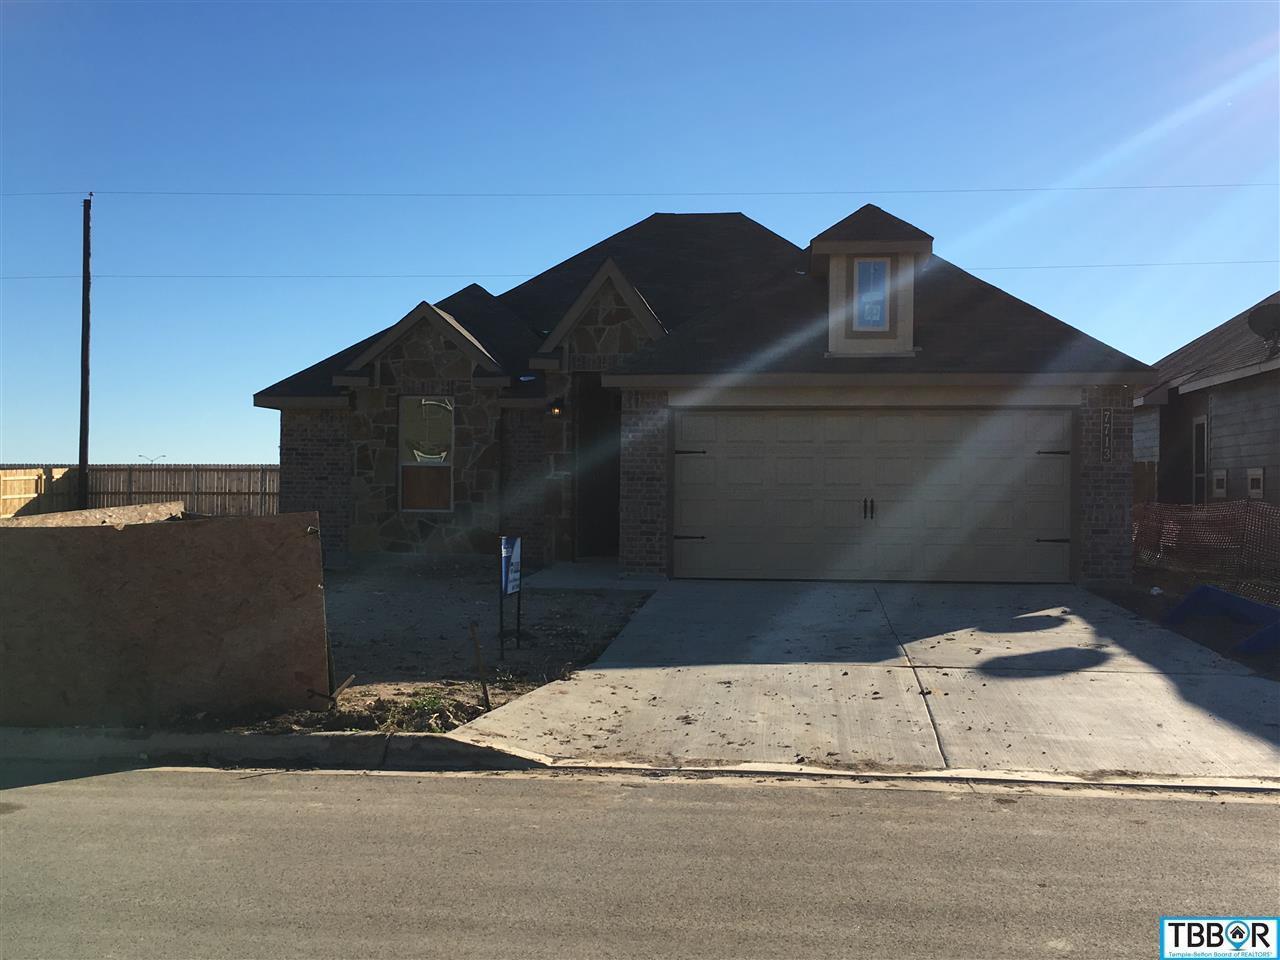 7713 Northgate Loop, Temple TX 76502 - Photo 1